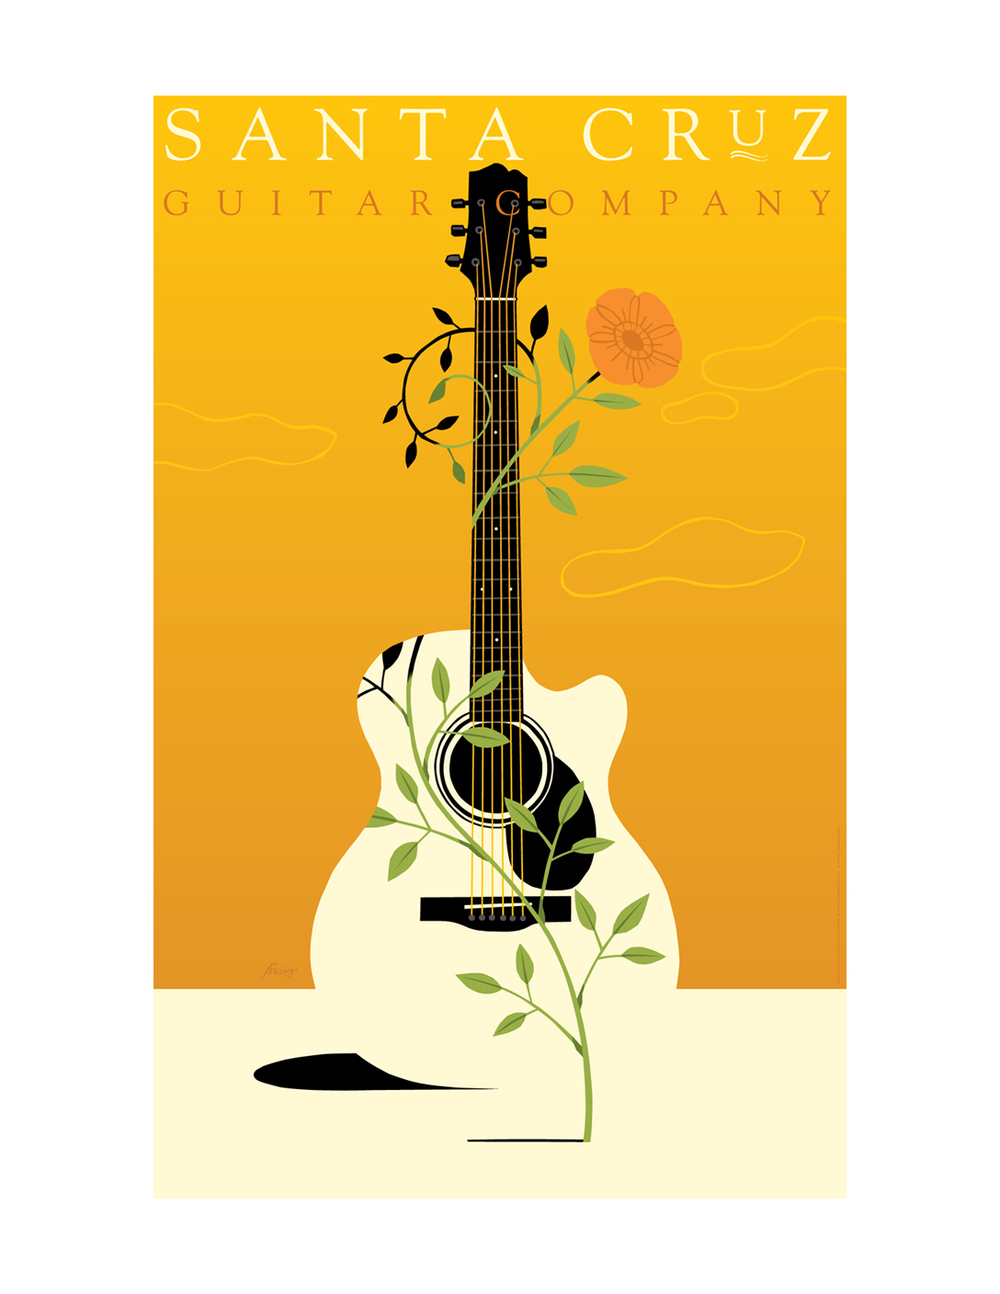 Sant Cruz Guitar Company